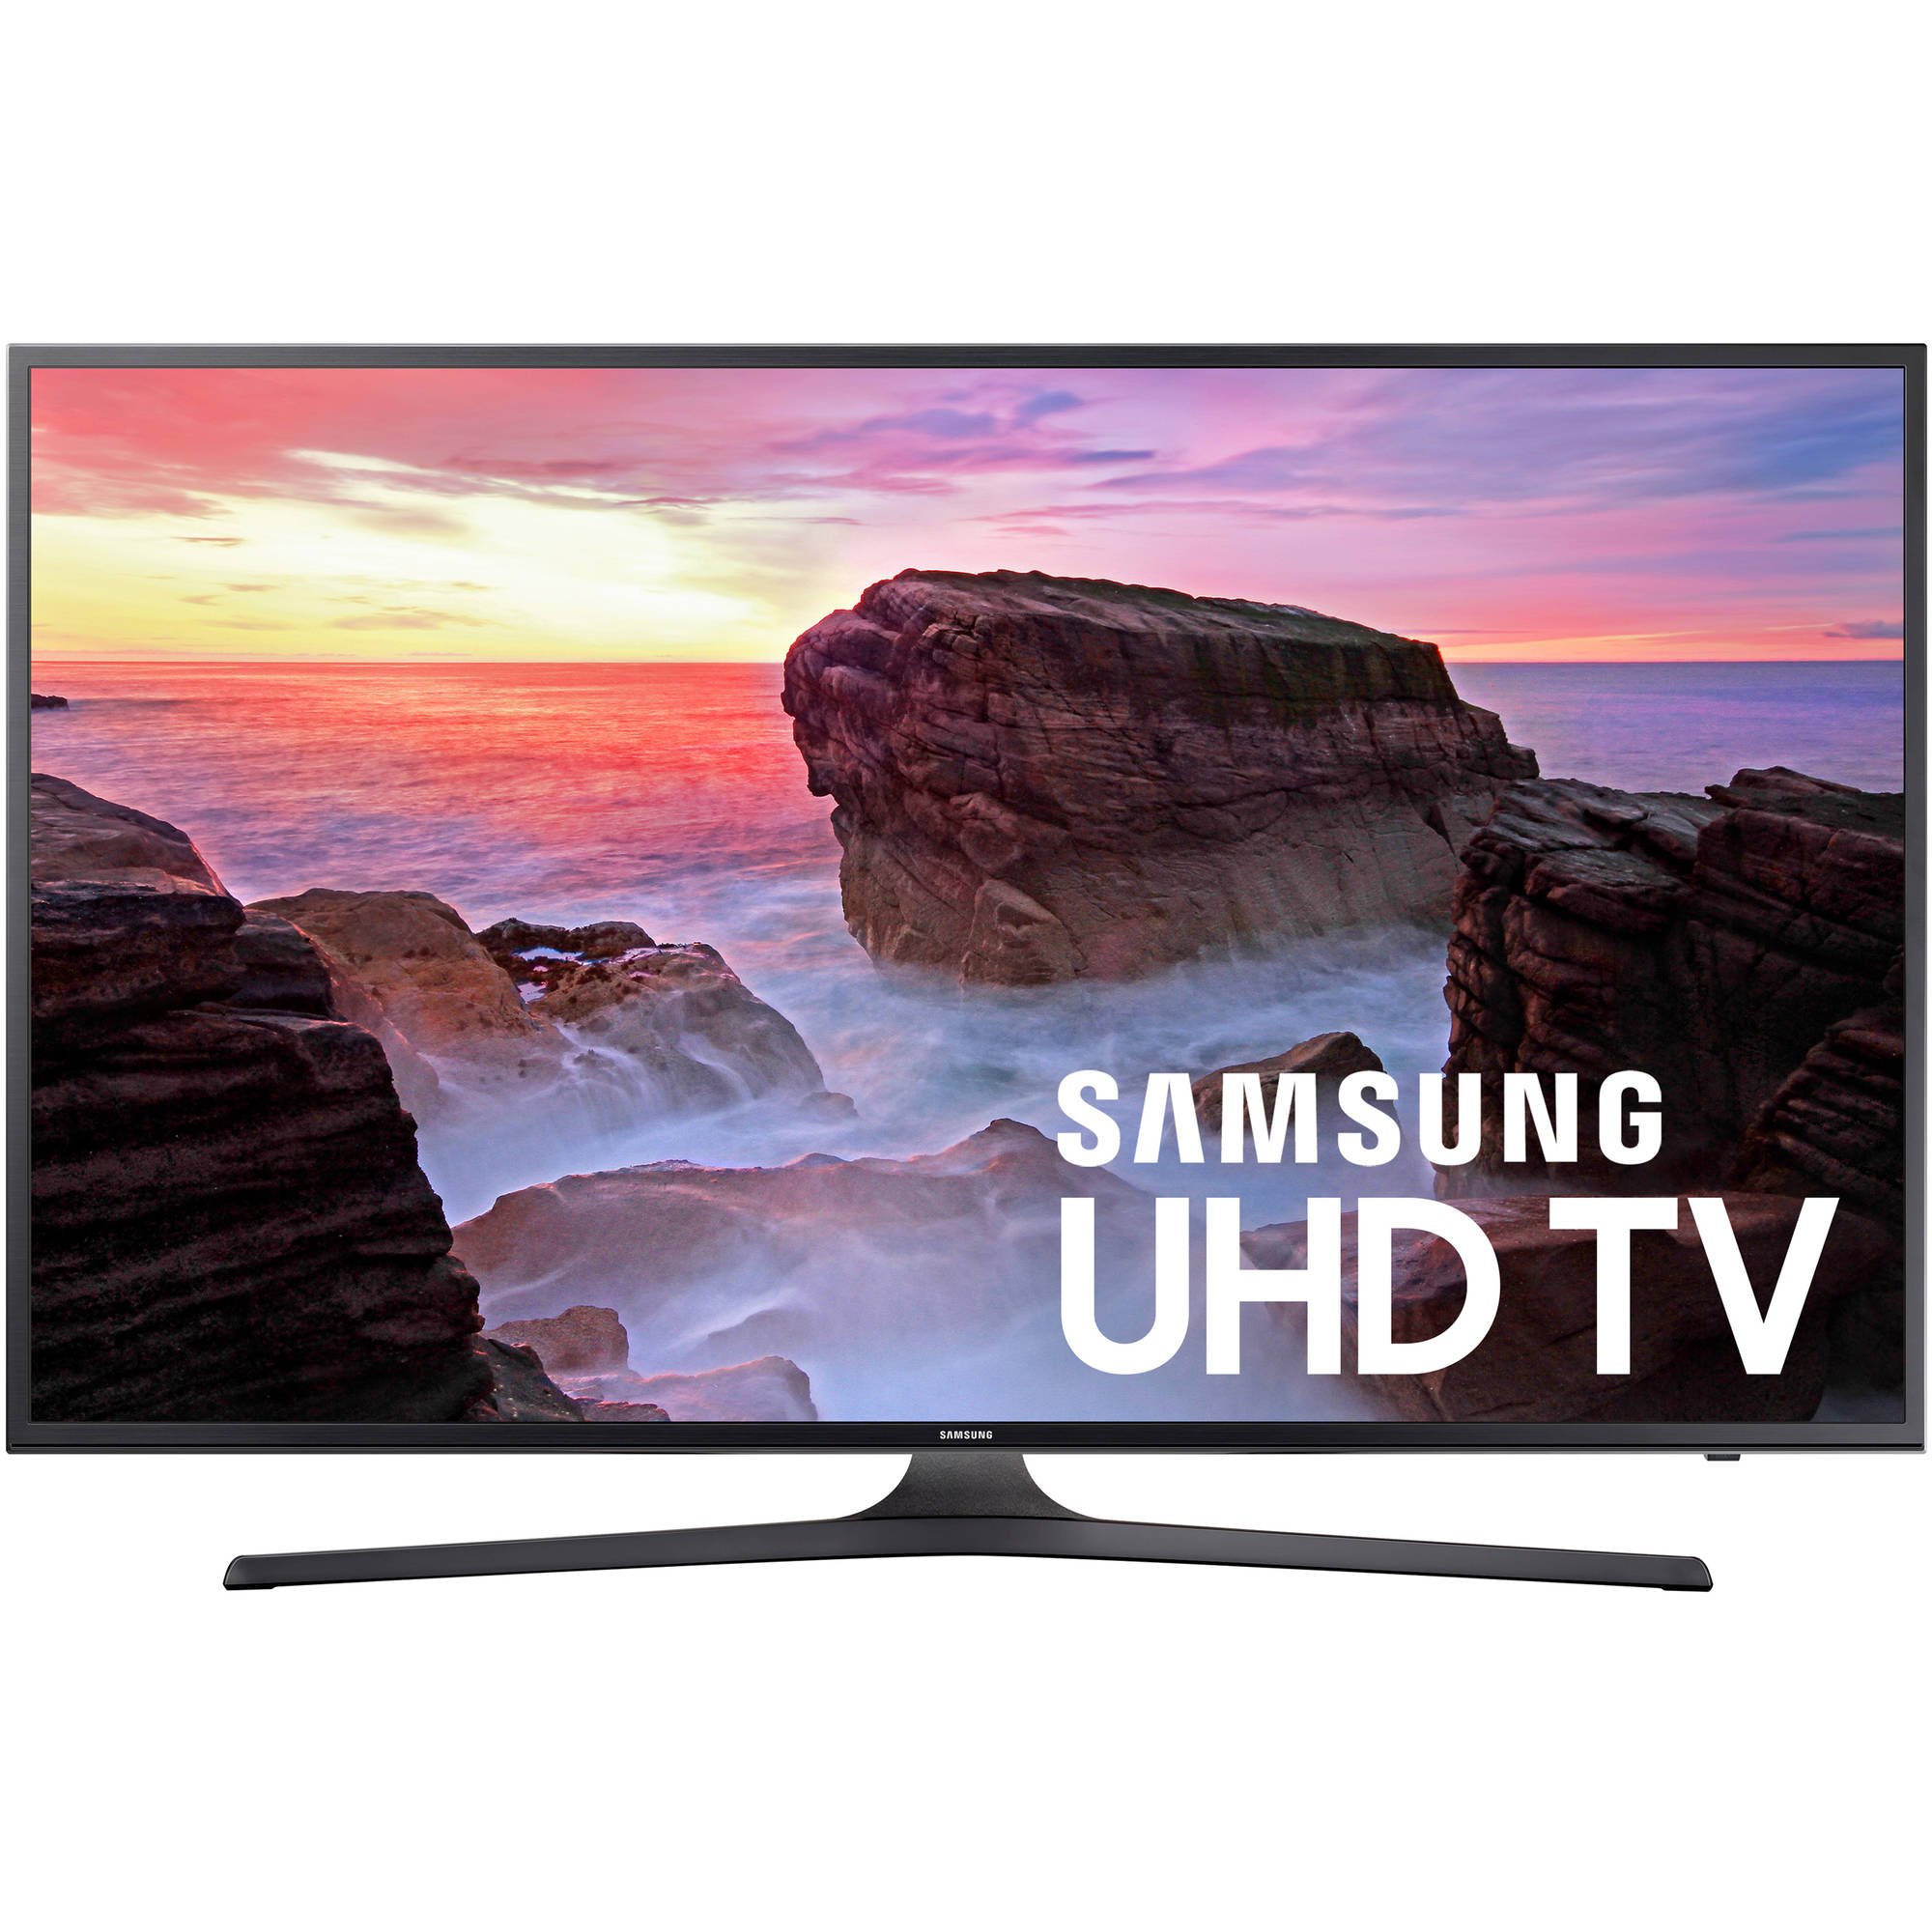 "SAMSUNG 75"" Class 4K (2160P) Ultra HD Smart LED TV (UN75MU6300FXZA)"